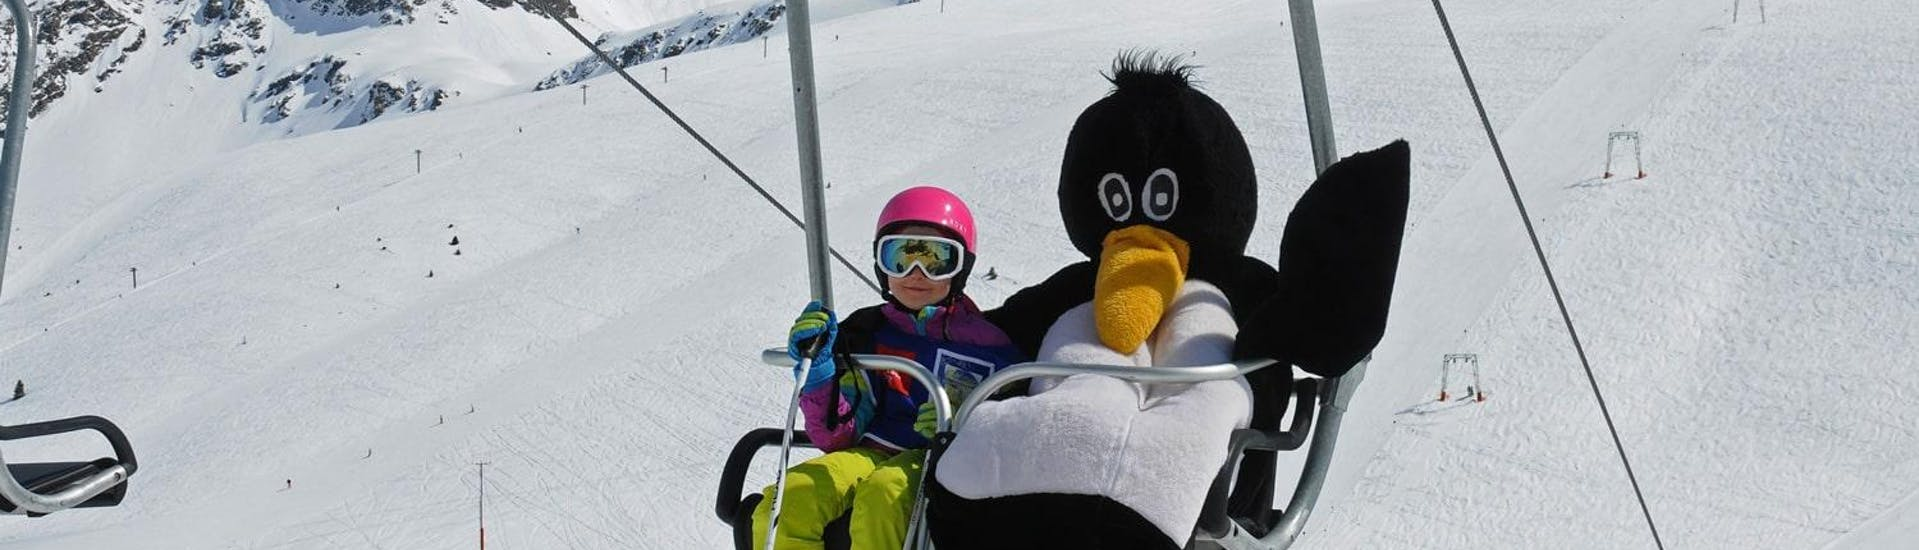 Private Ski Lessons for Kids of All Ages avec 1. Schi- und Snowboardschule Kühtai - Hero image